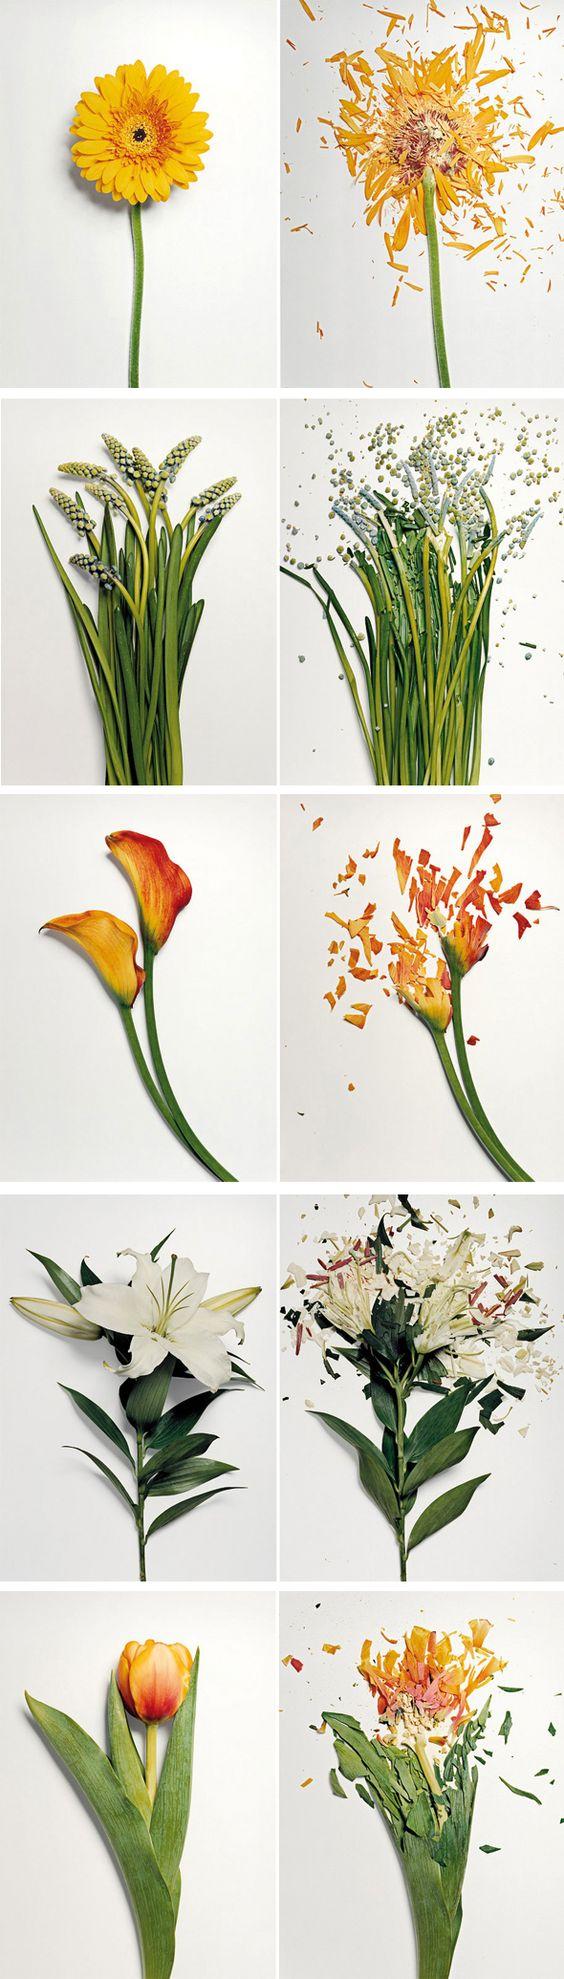 Broken-Flowers-Jon-Shireman-